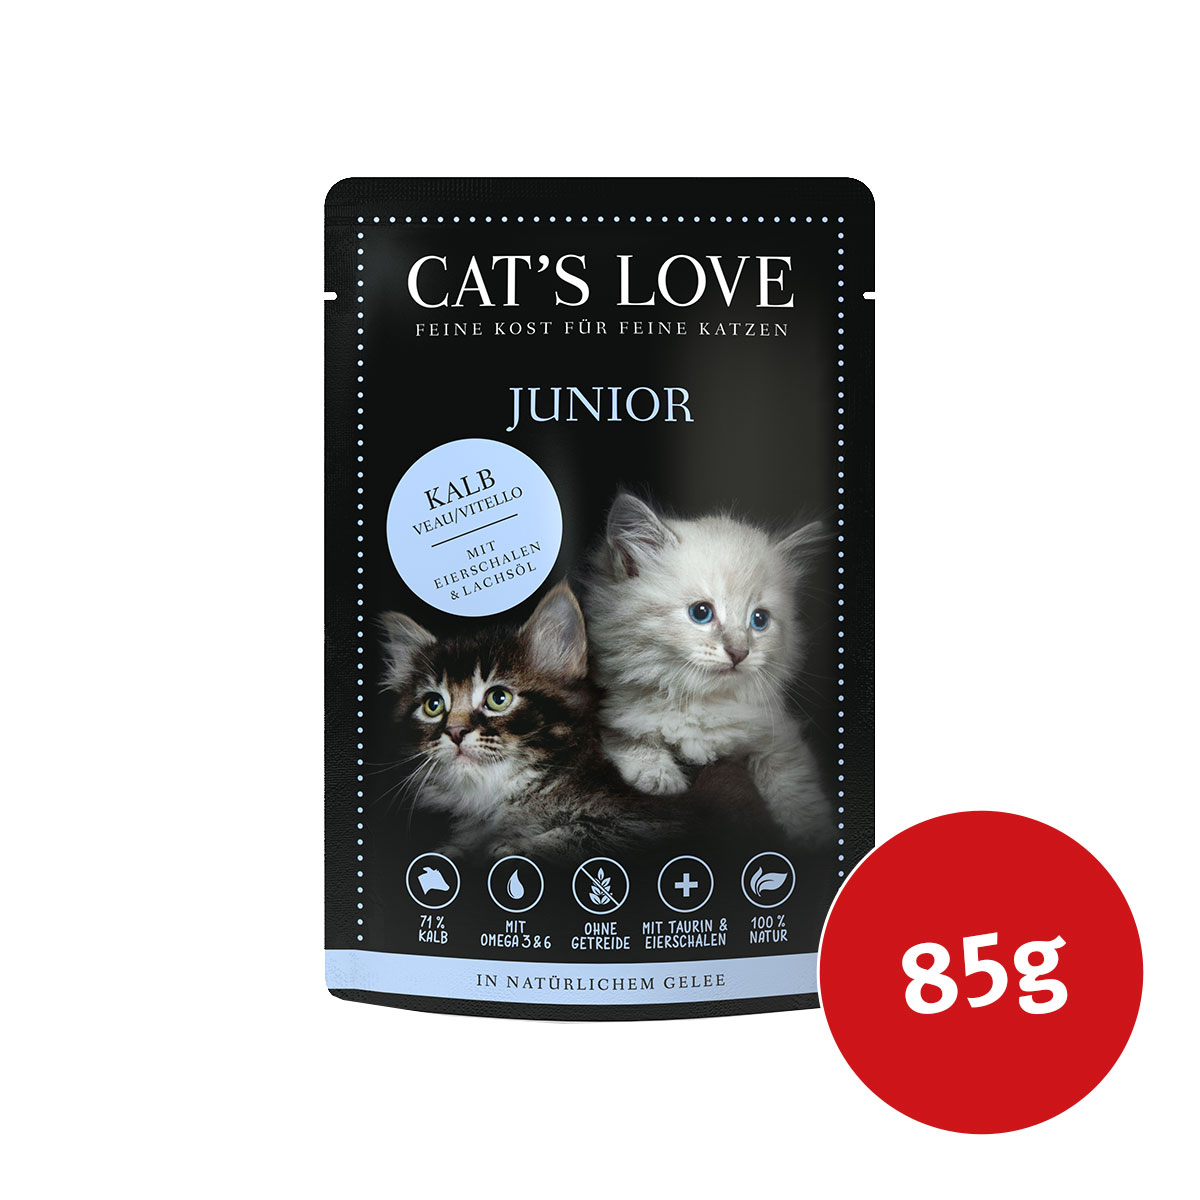 cat 39 s love nassfutter junior kalb mit eierschalen lachs l. Black Bedroom Furniture Sets. Home Design Ideas